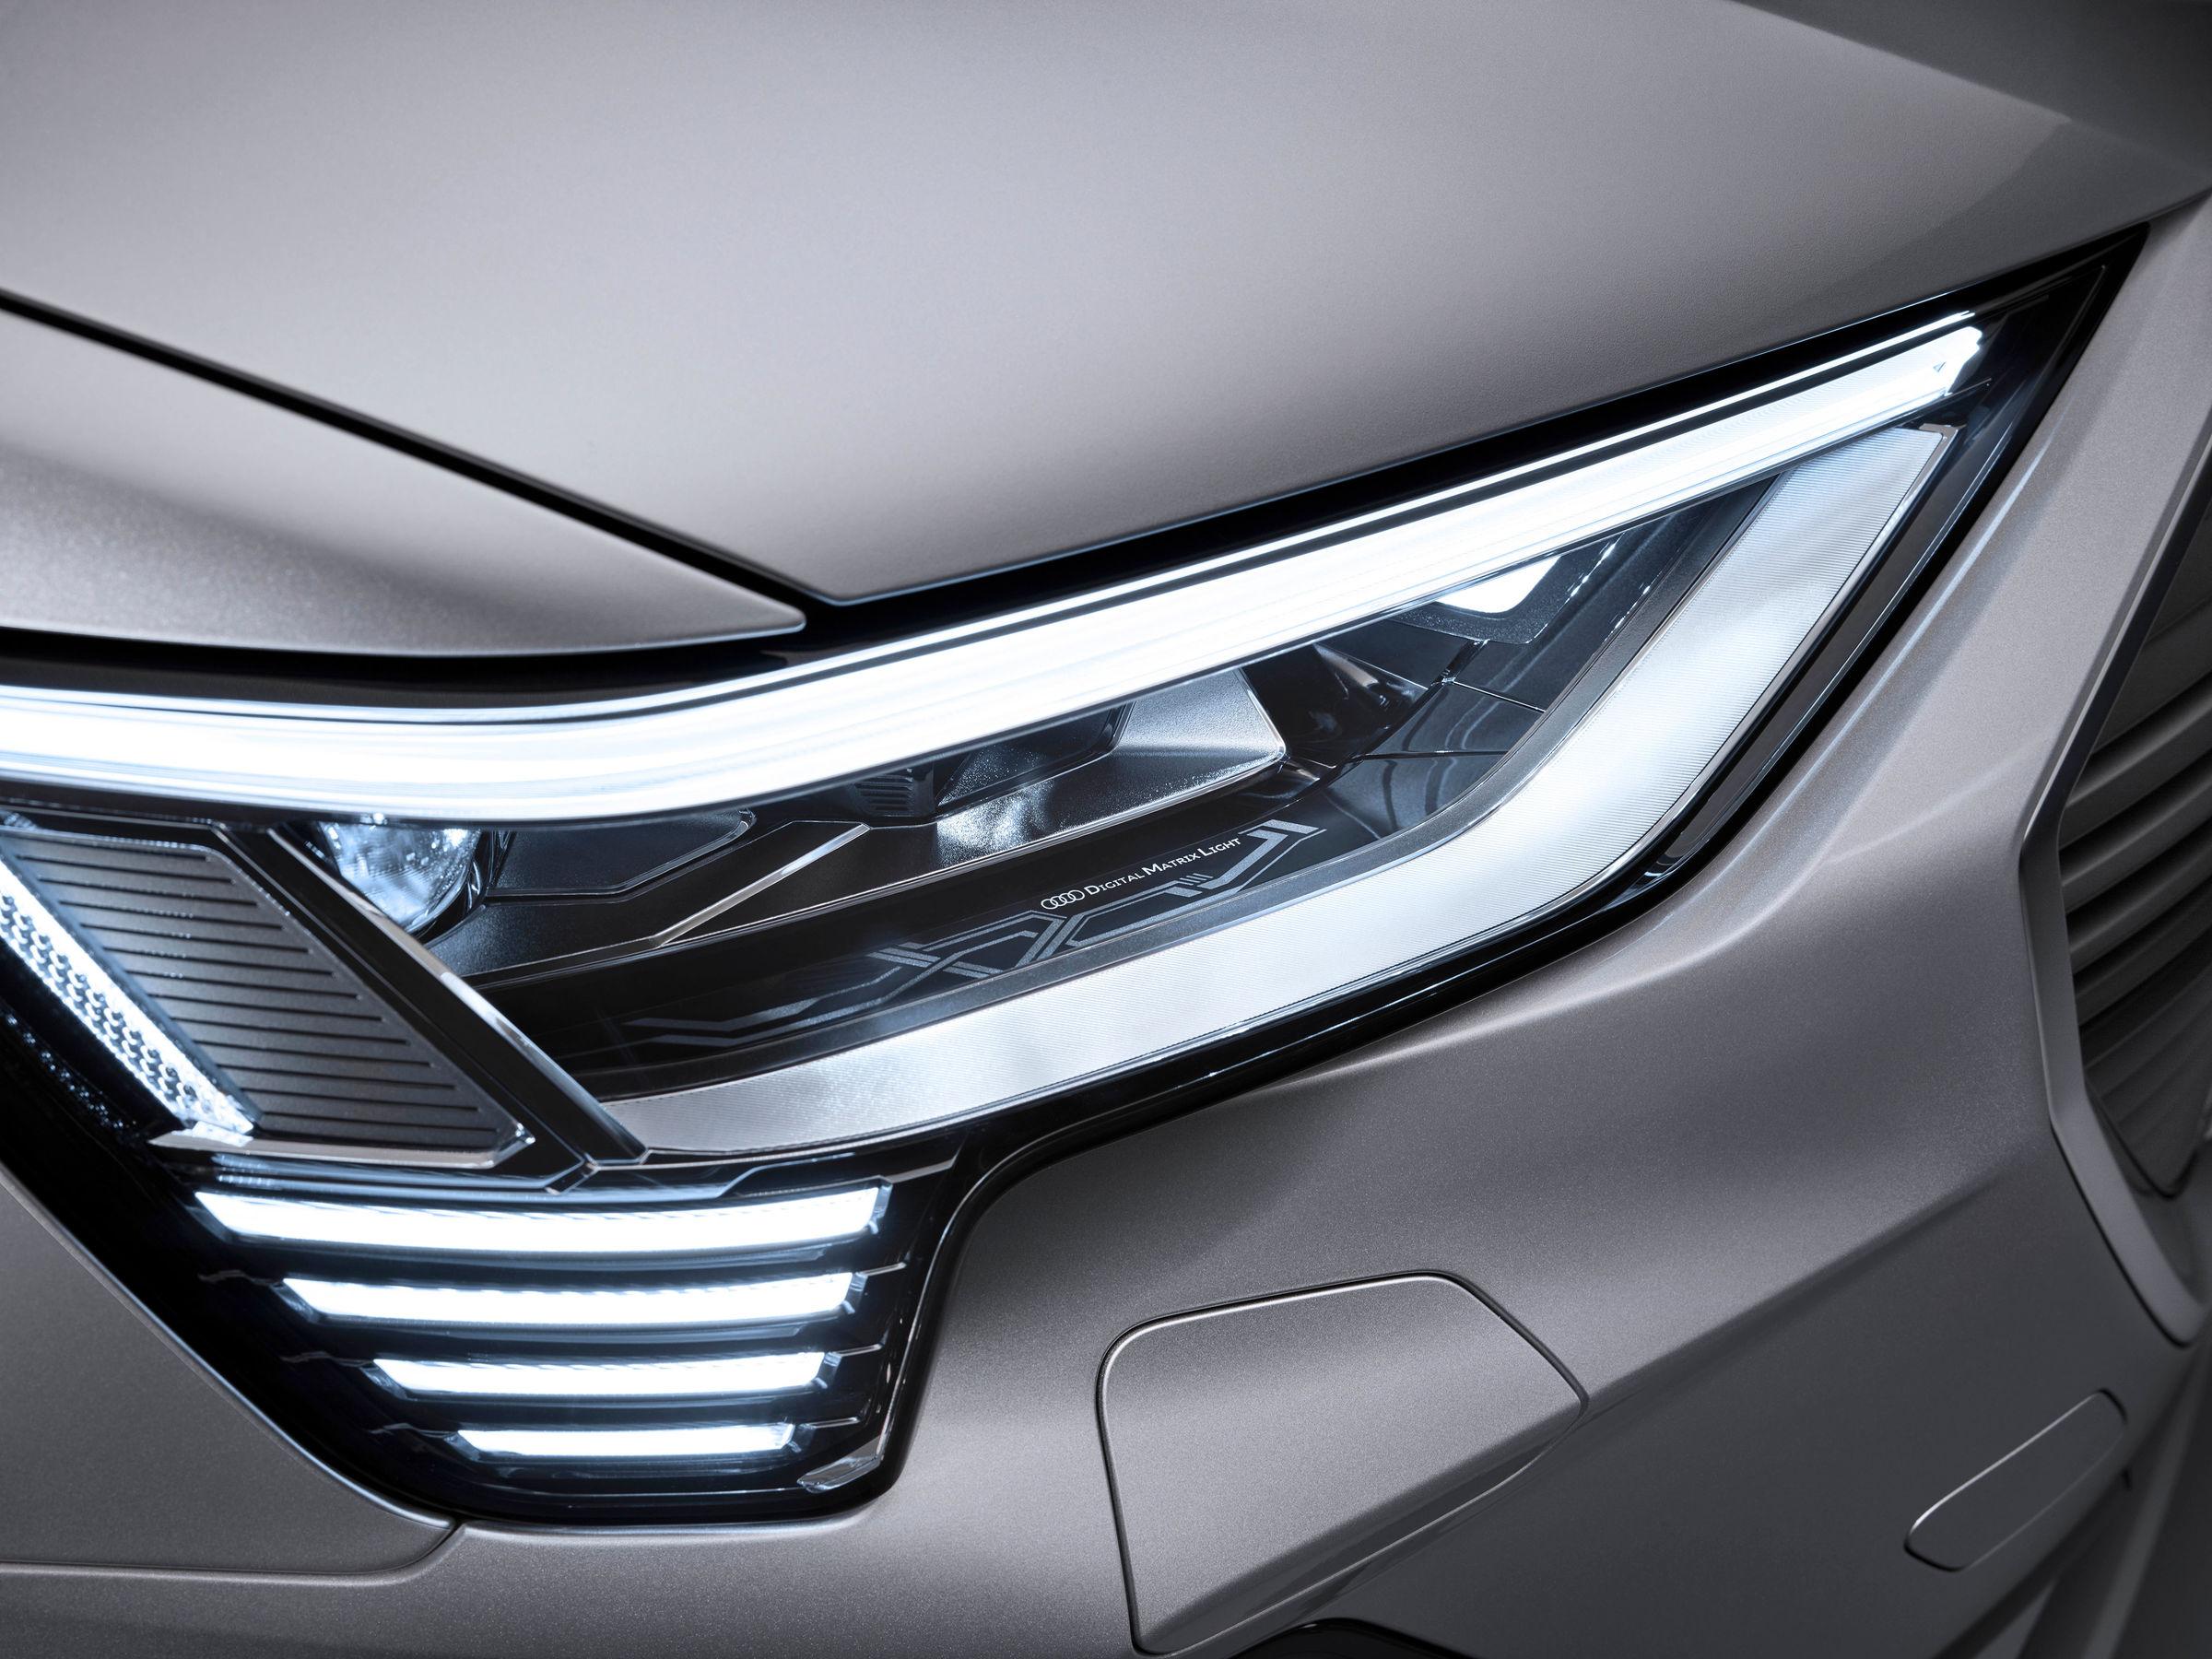 Audi e-tron Sportback headlights